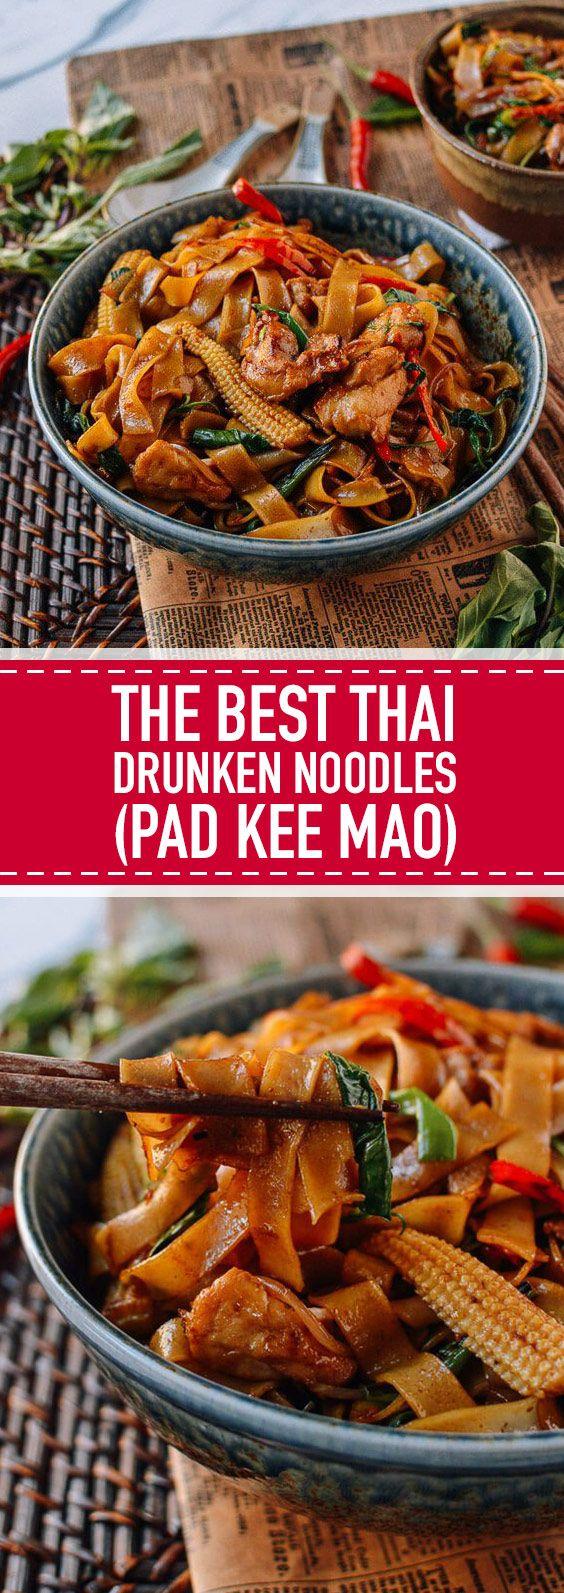 The Best Thai Drunken Noodles (Pad Kee Mao)   This…